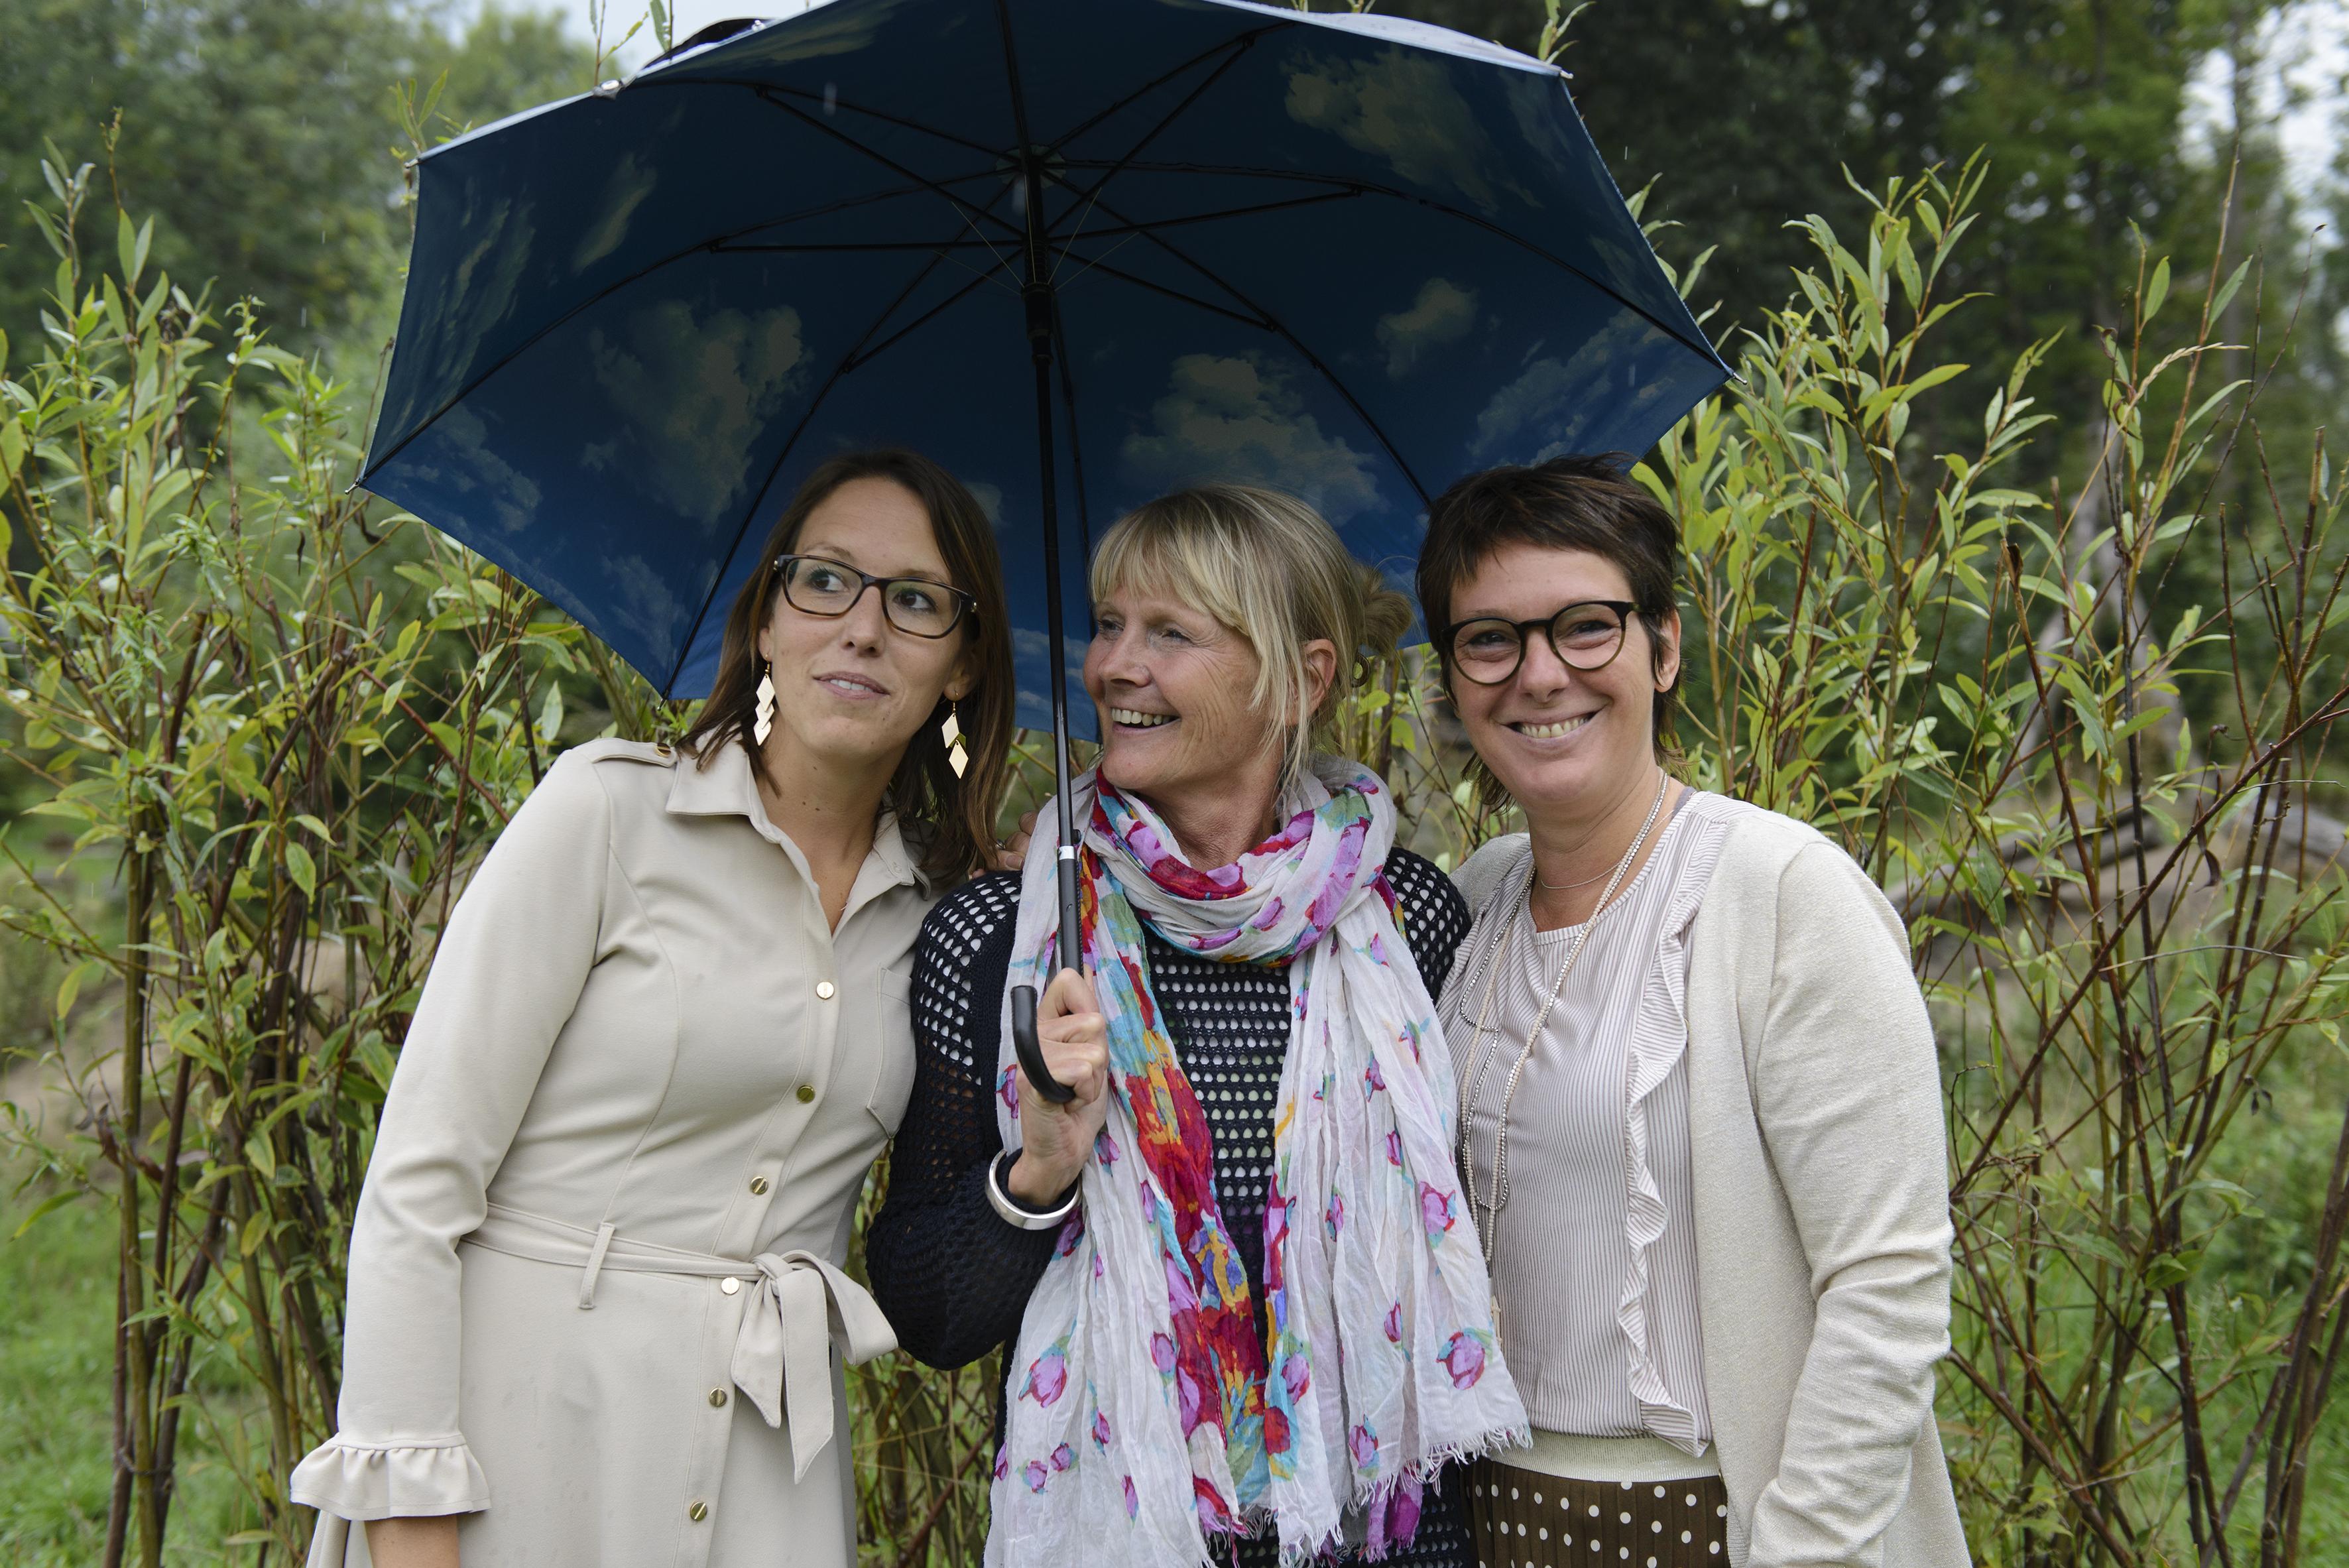 <p>2de kleuterklas: juf Elke, juf Katrien en juf Kathleen</p>